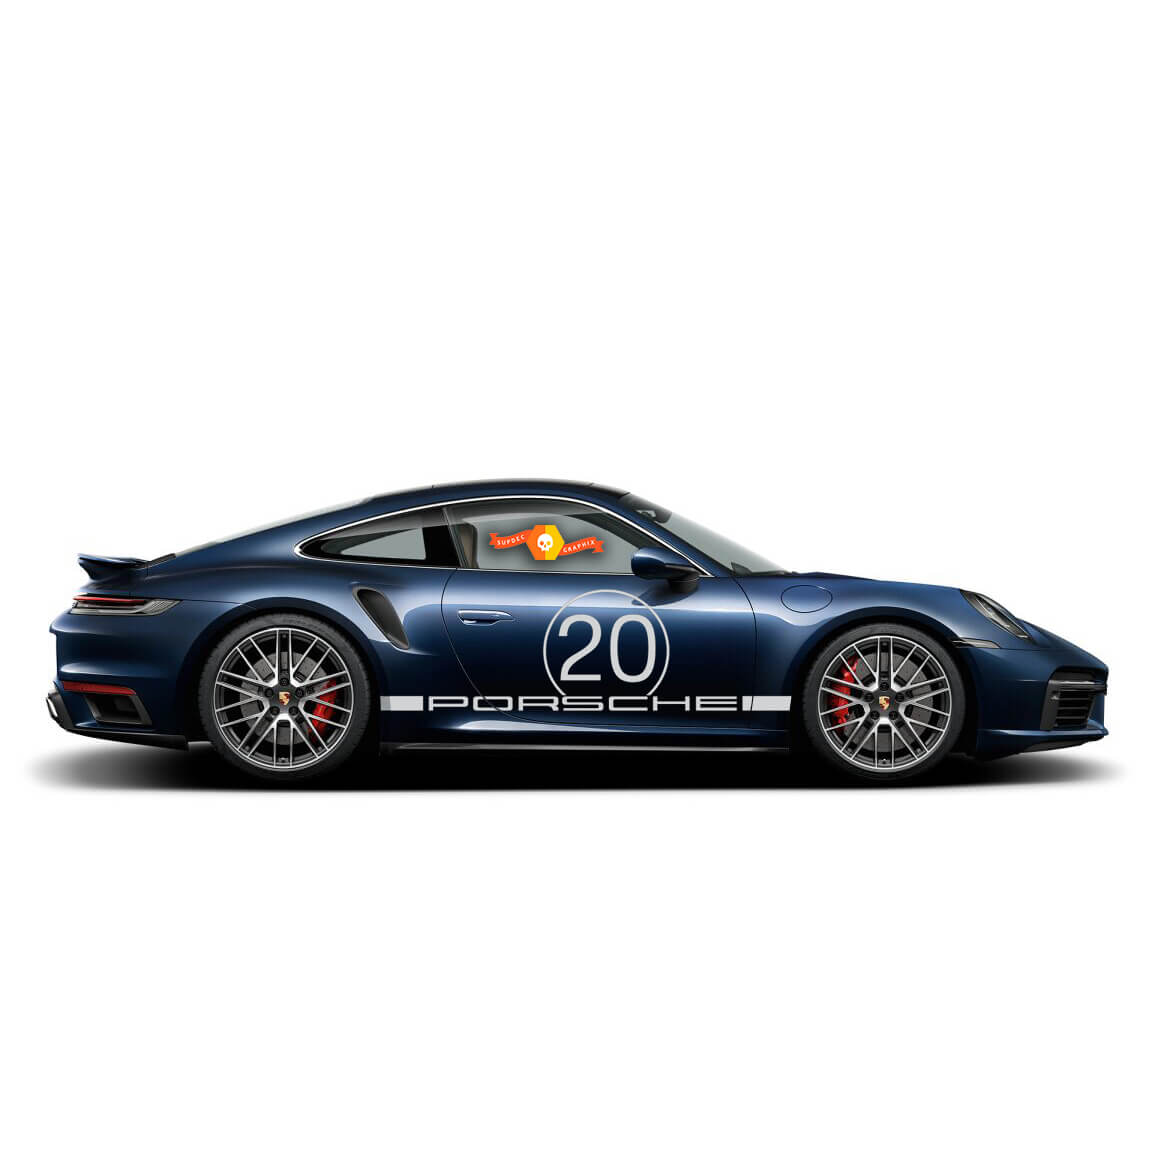 Porsche 911 Turbo S Racing Side Stripes For Carrera Side Stripes